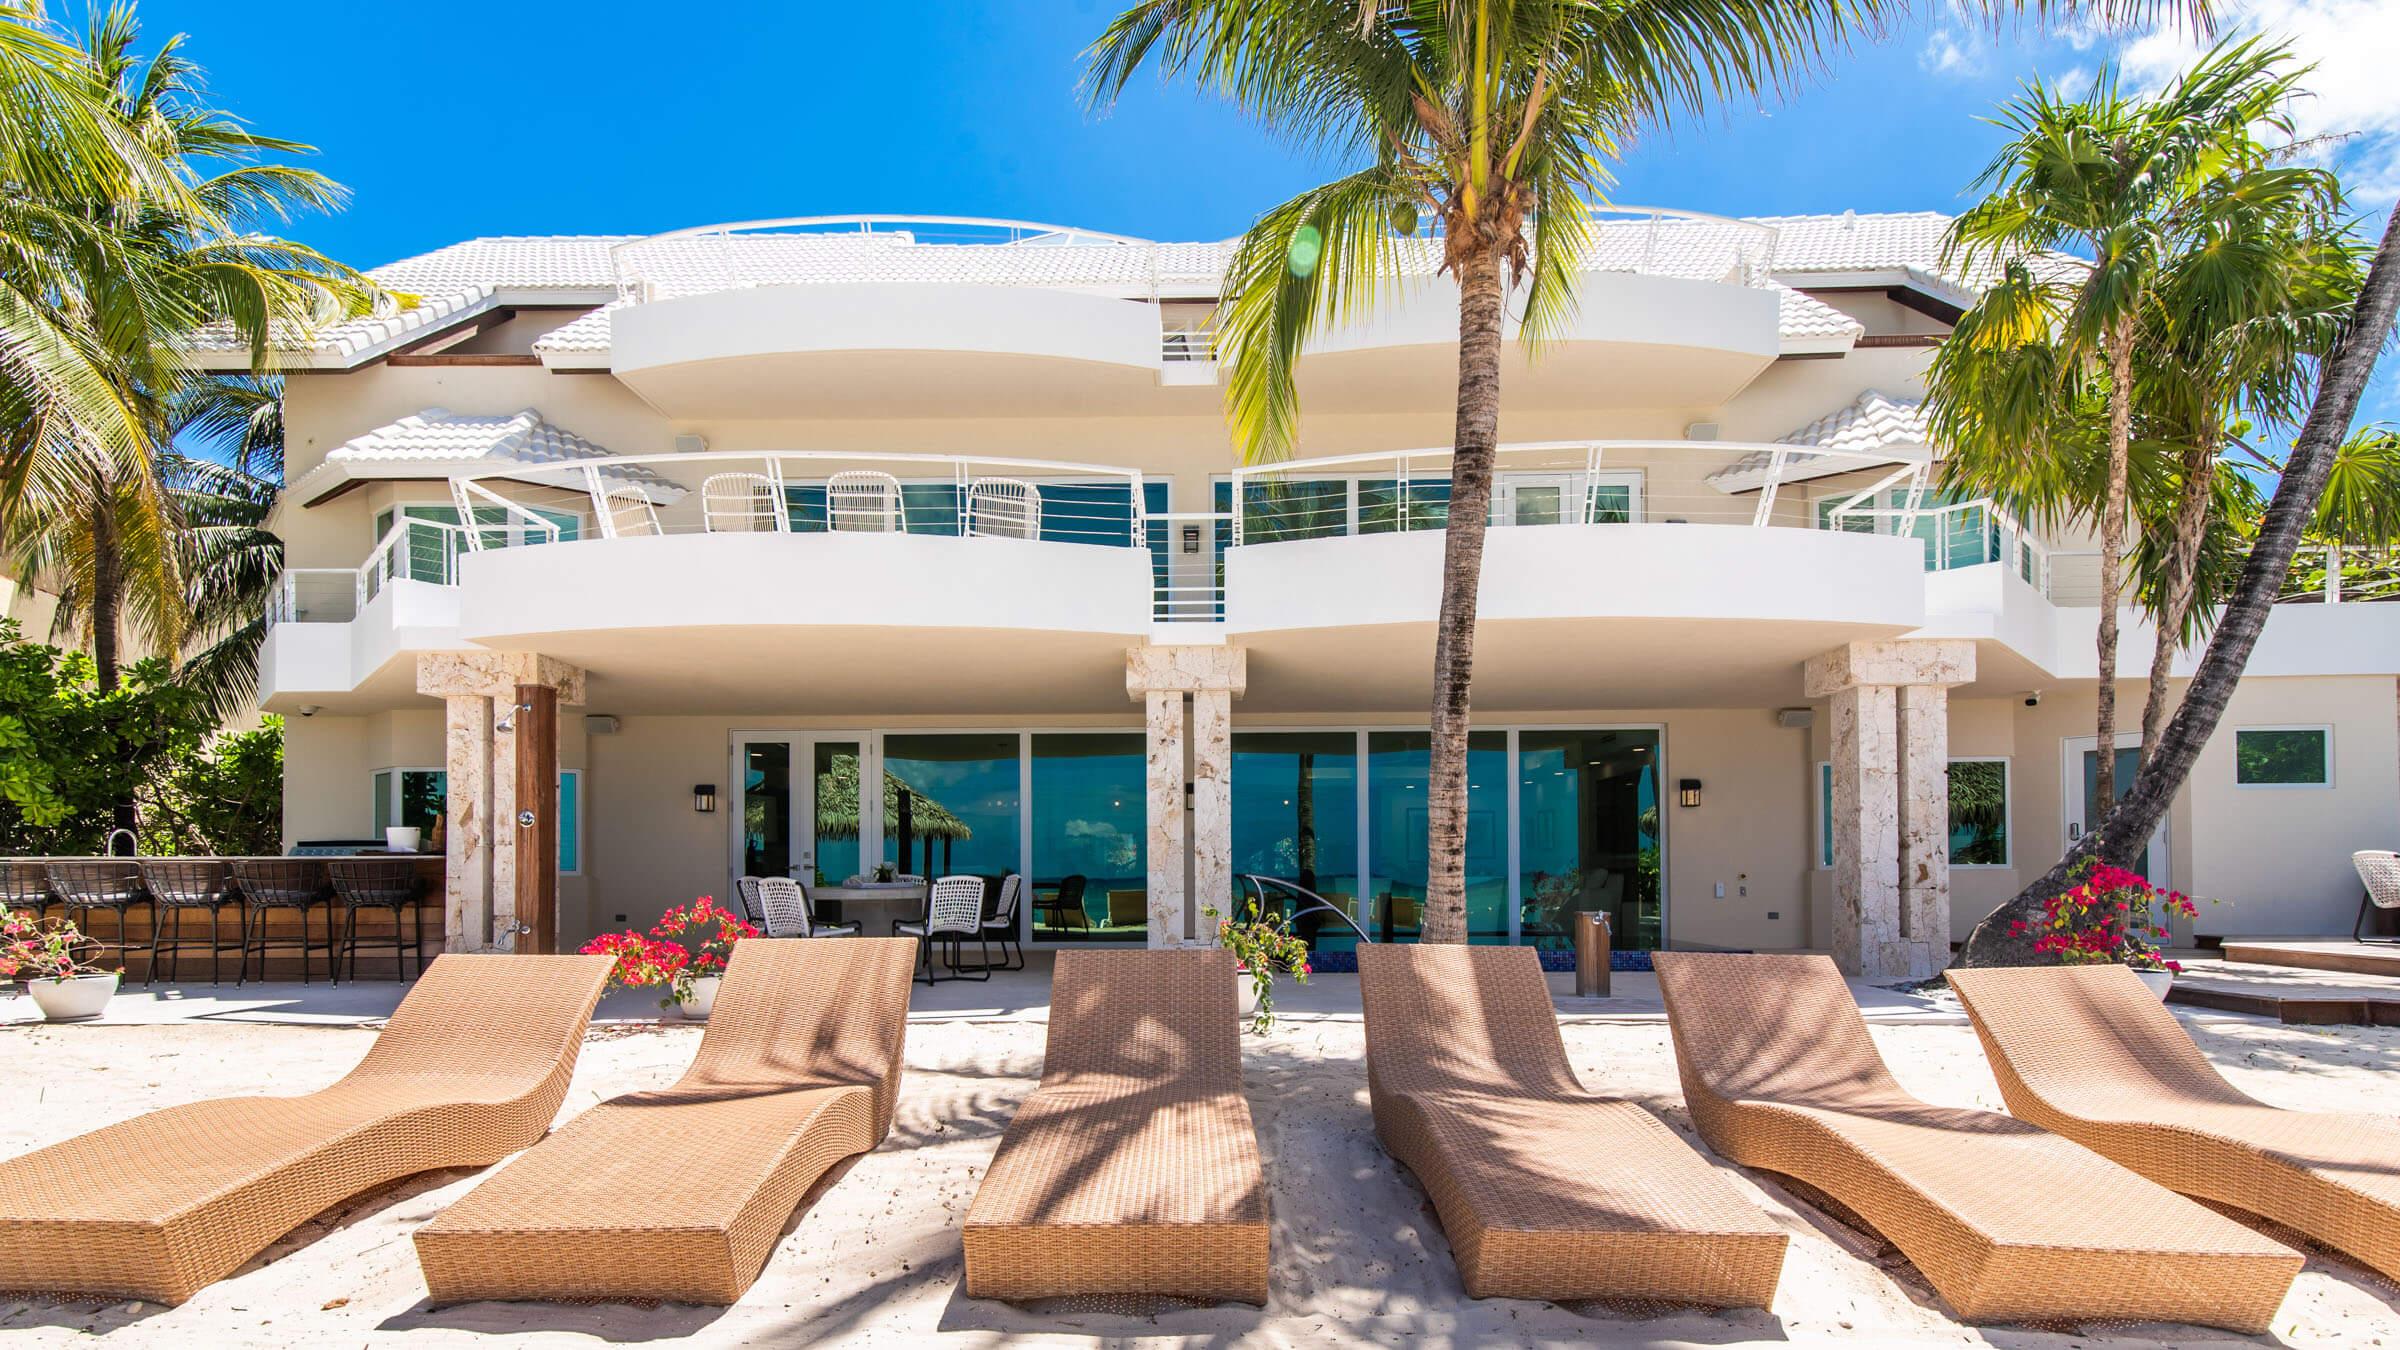 Seascape-Villa-Beach-Villa-Cayman-Islands-Grand-Cayman-Paradise-Beach-View-Sand-Loung-Chairs.jpg